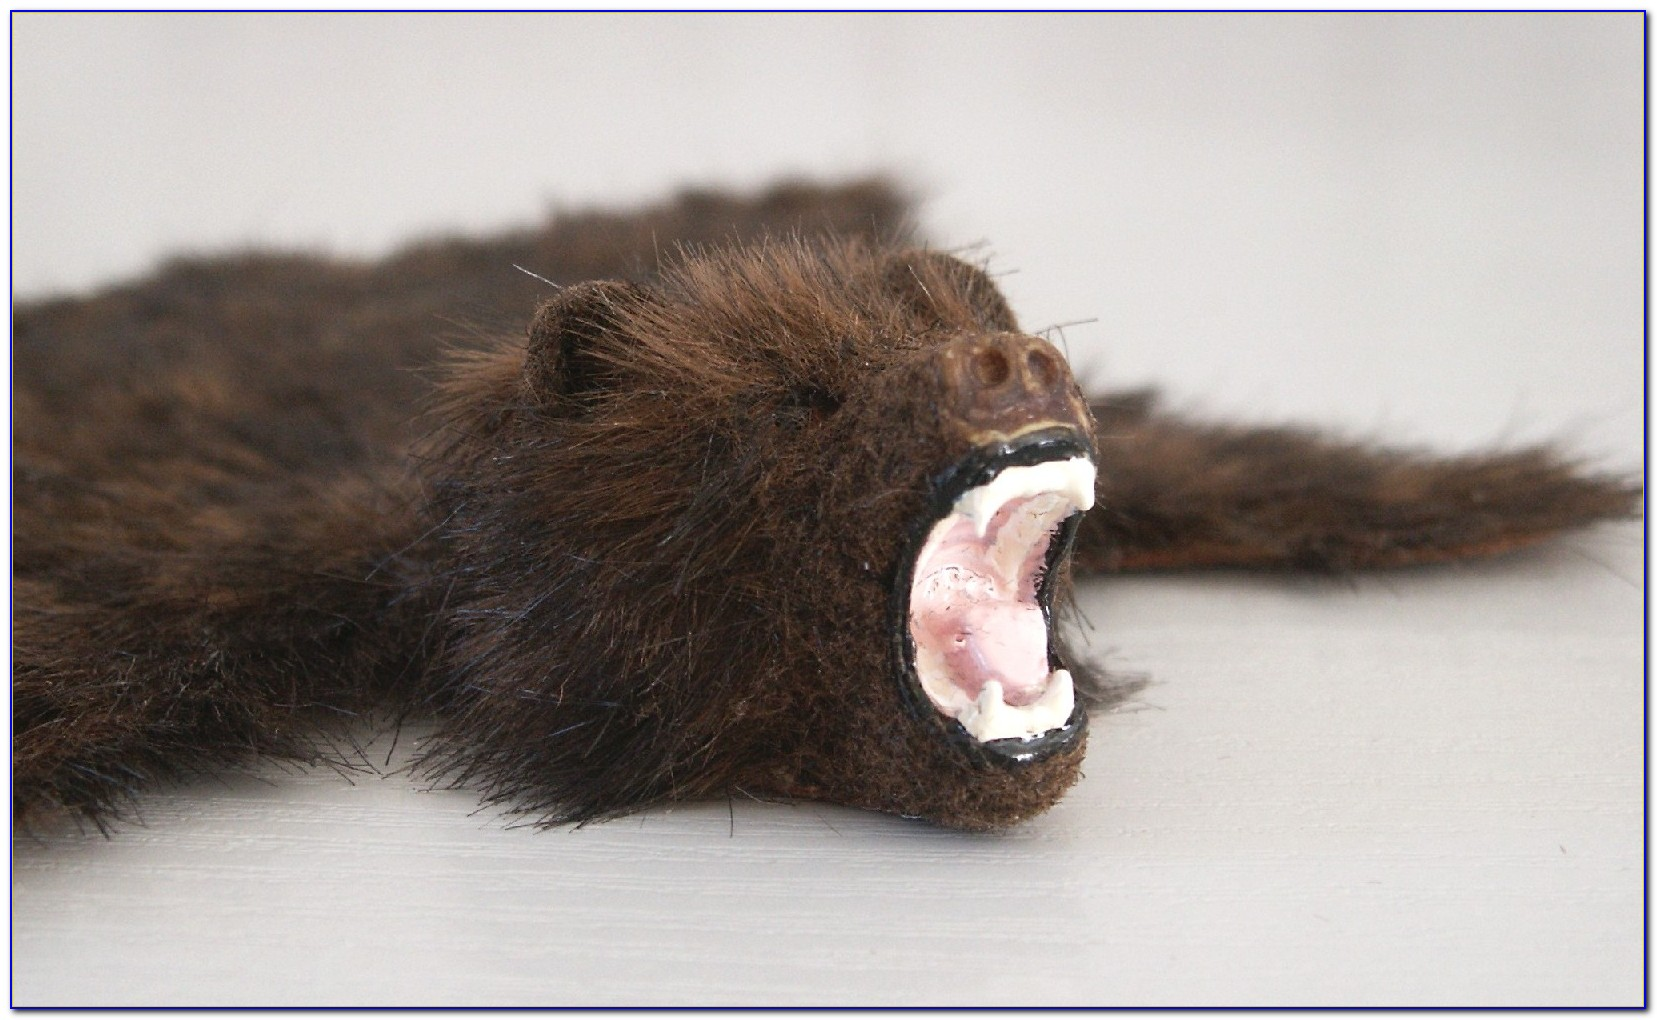 Bear Skin Rugs Illegal